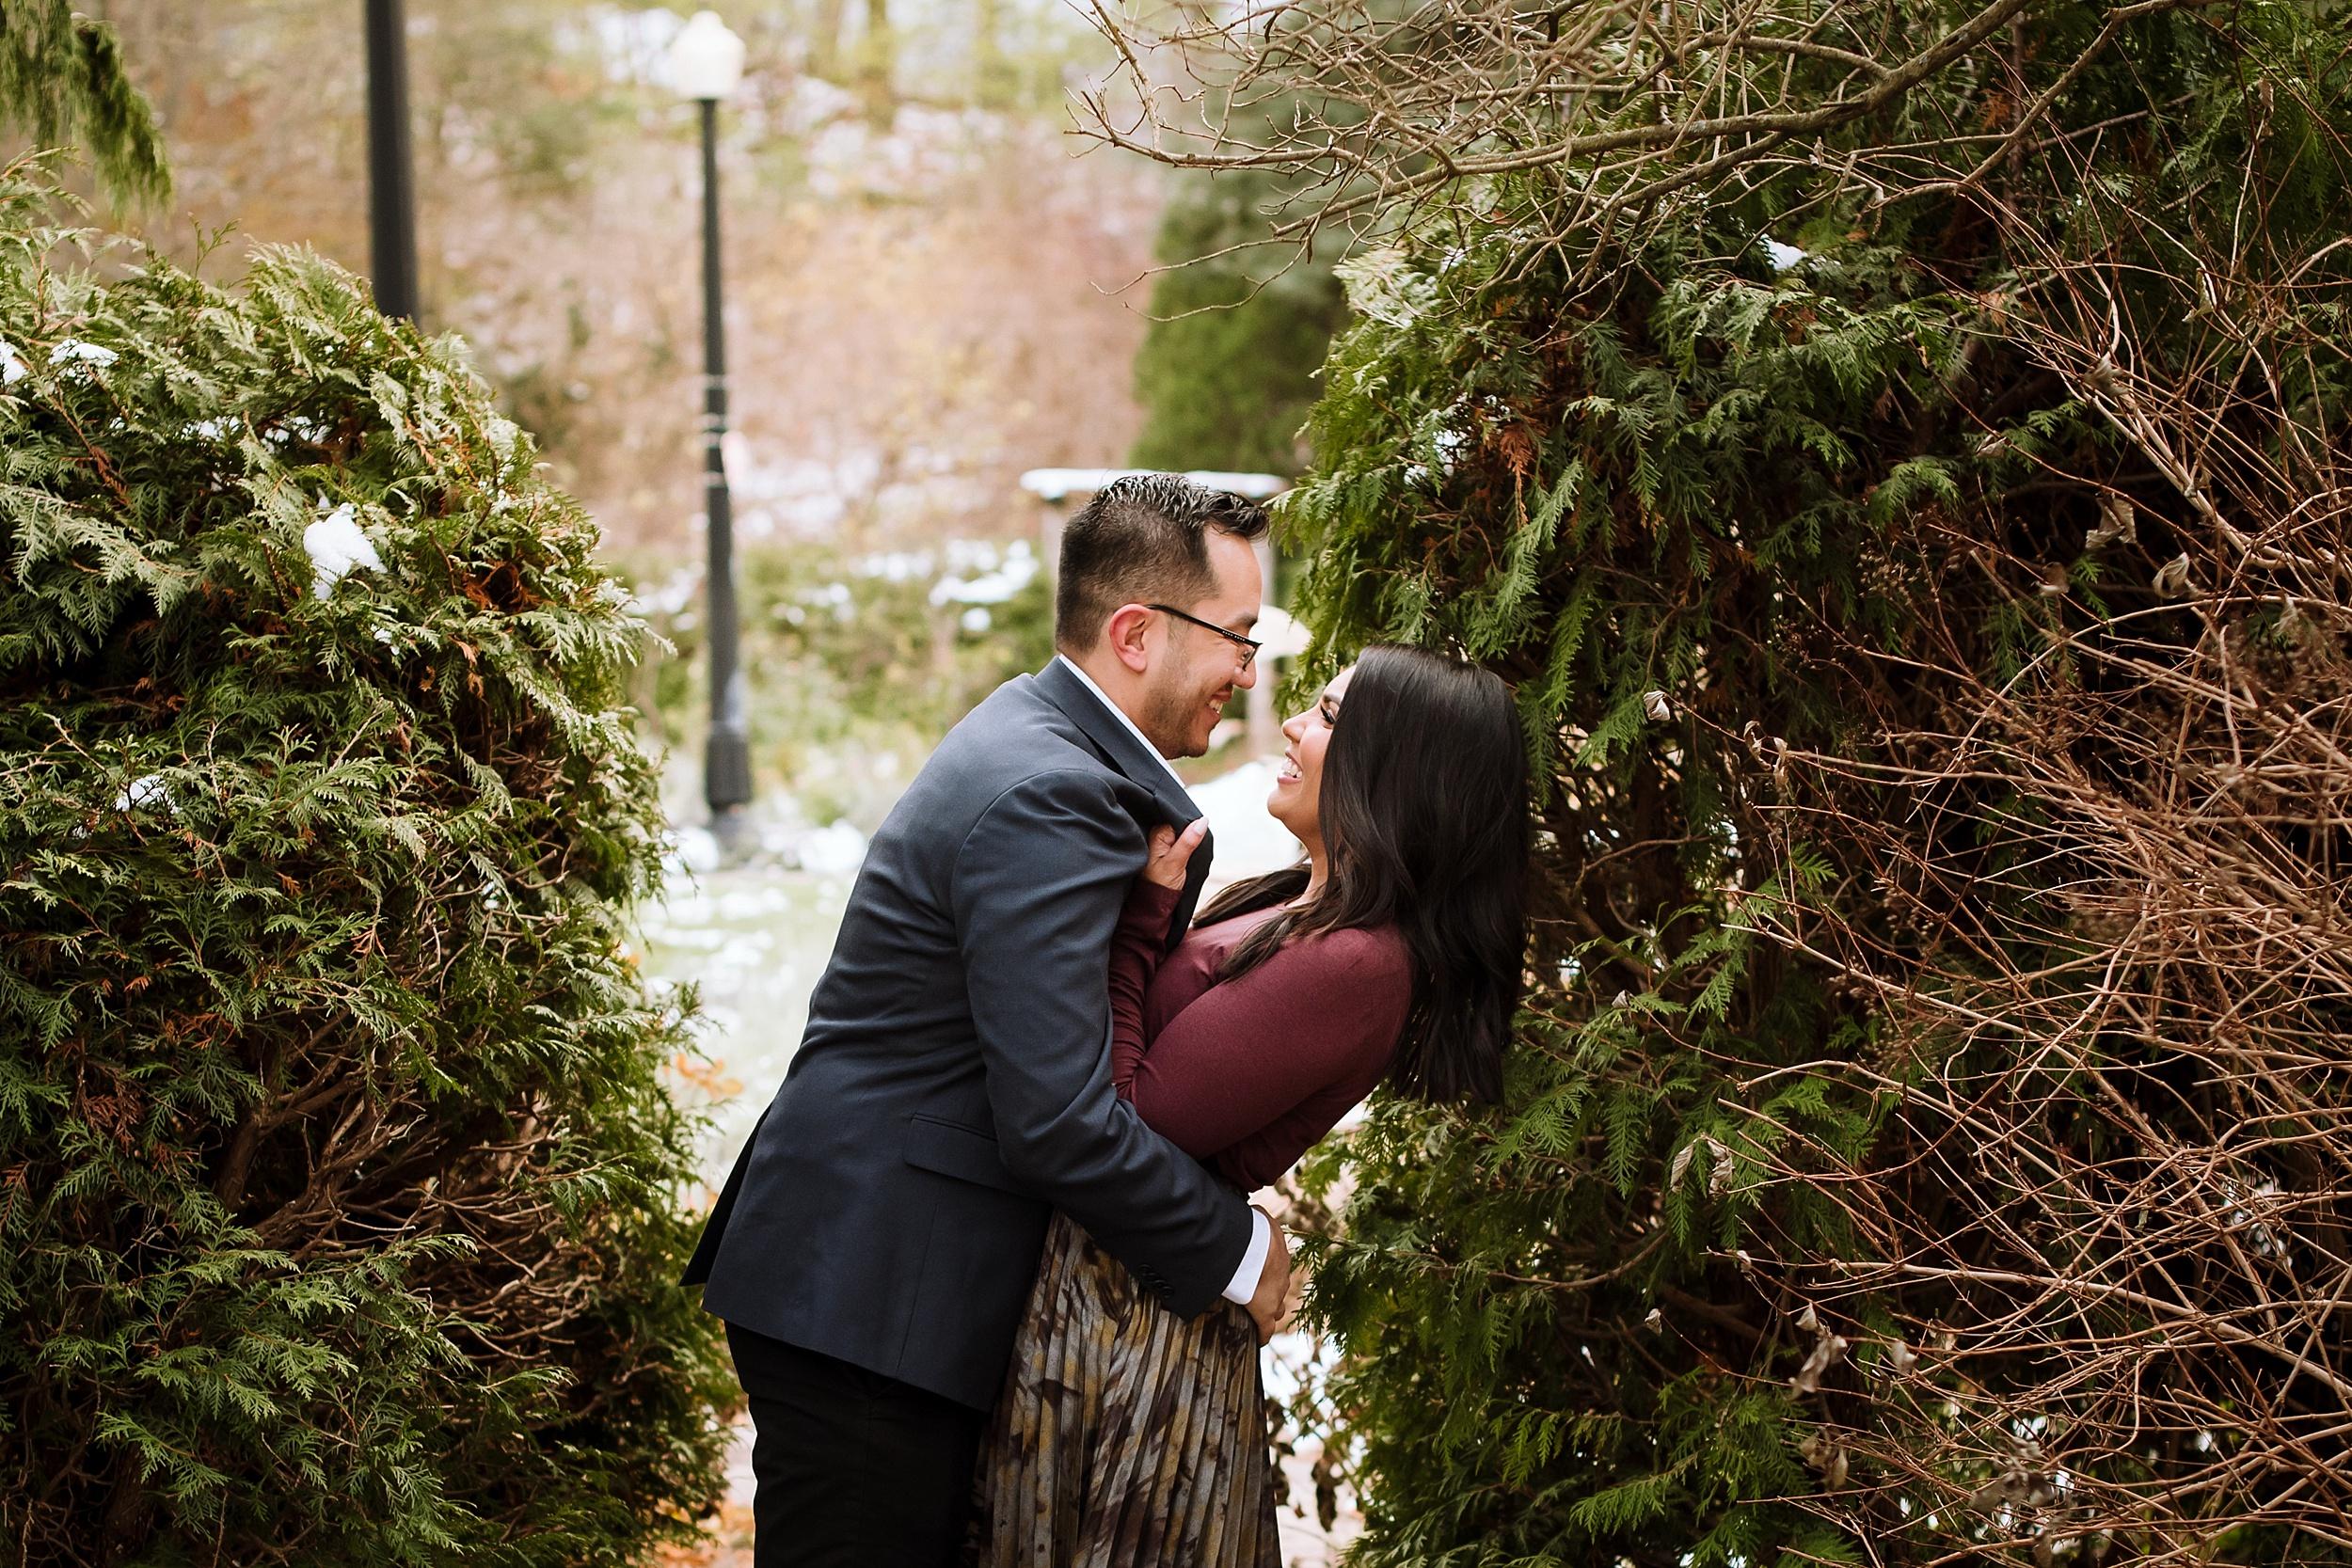 Alexander_Muir_Memorial_Gardens_Engagement_Shoot_Toronto_Wedding_Photographer_0016.jpg